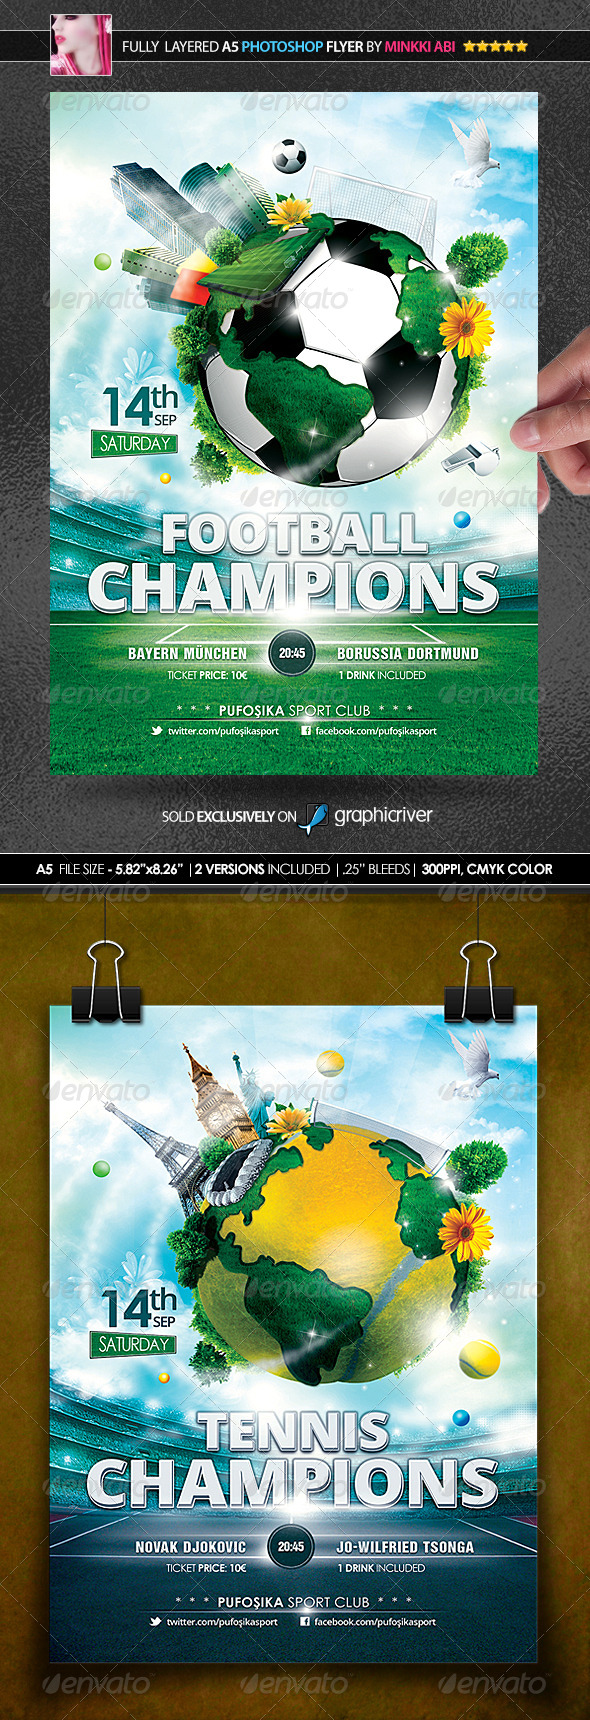 Sports World Vs.1 Poster Flyer